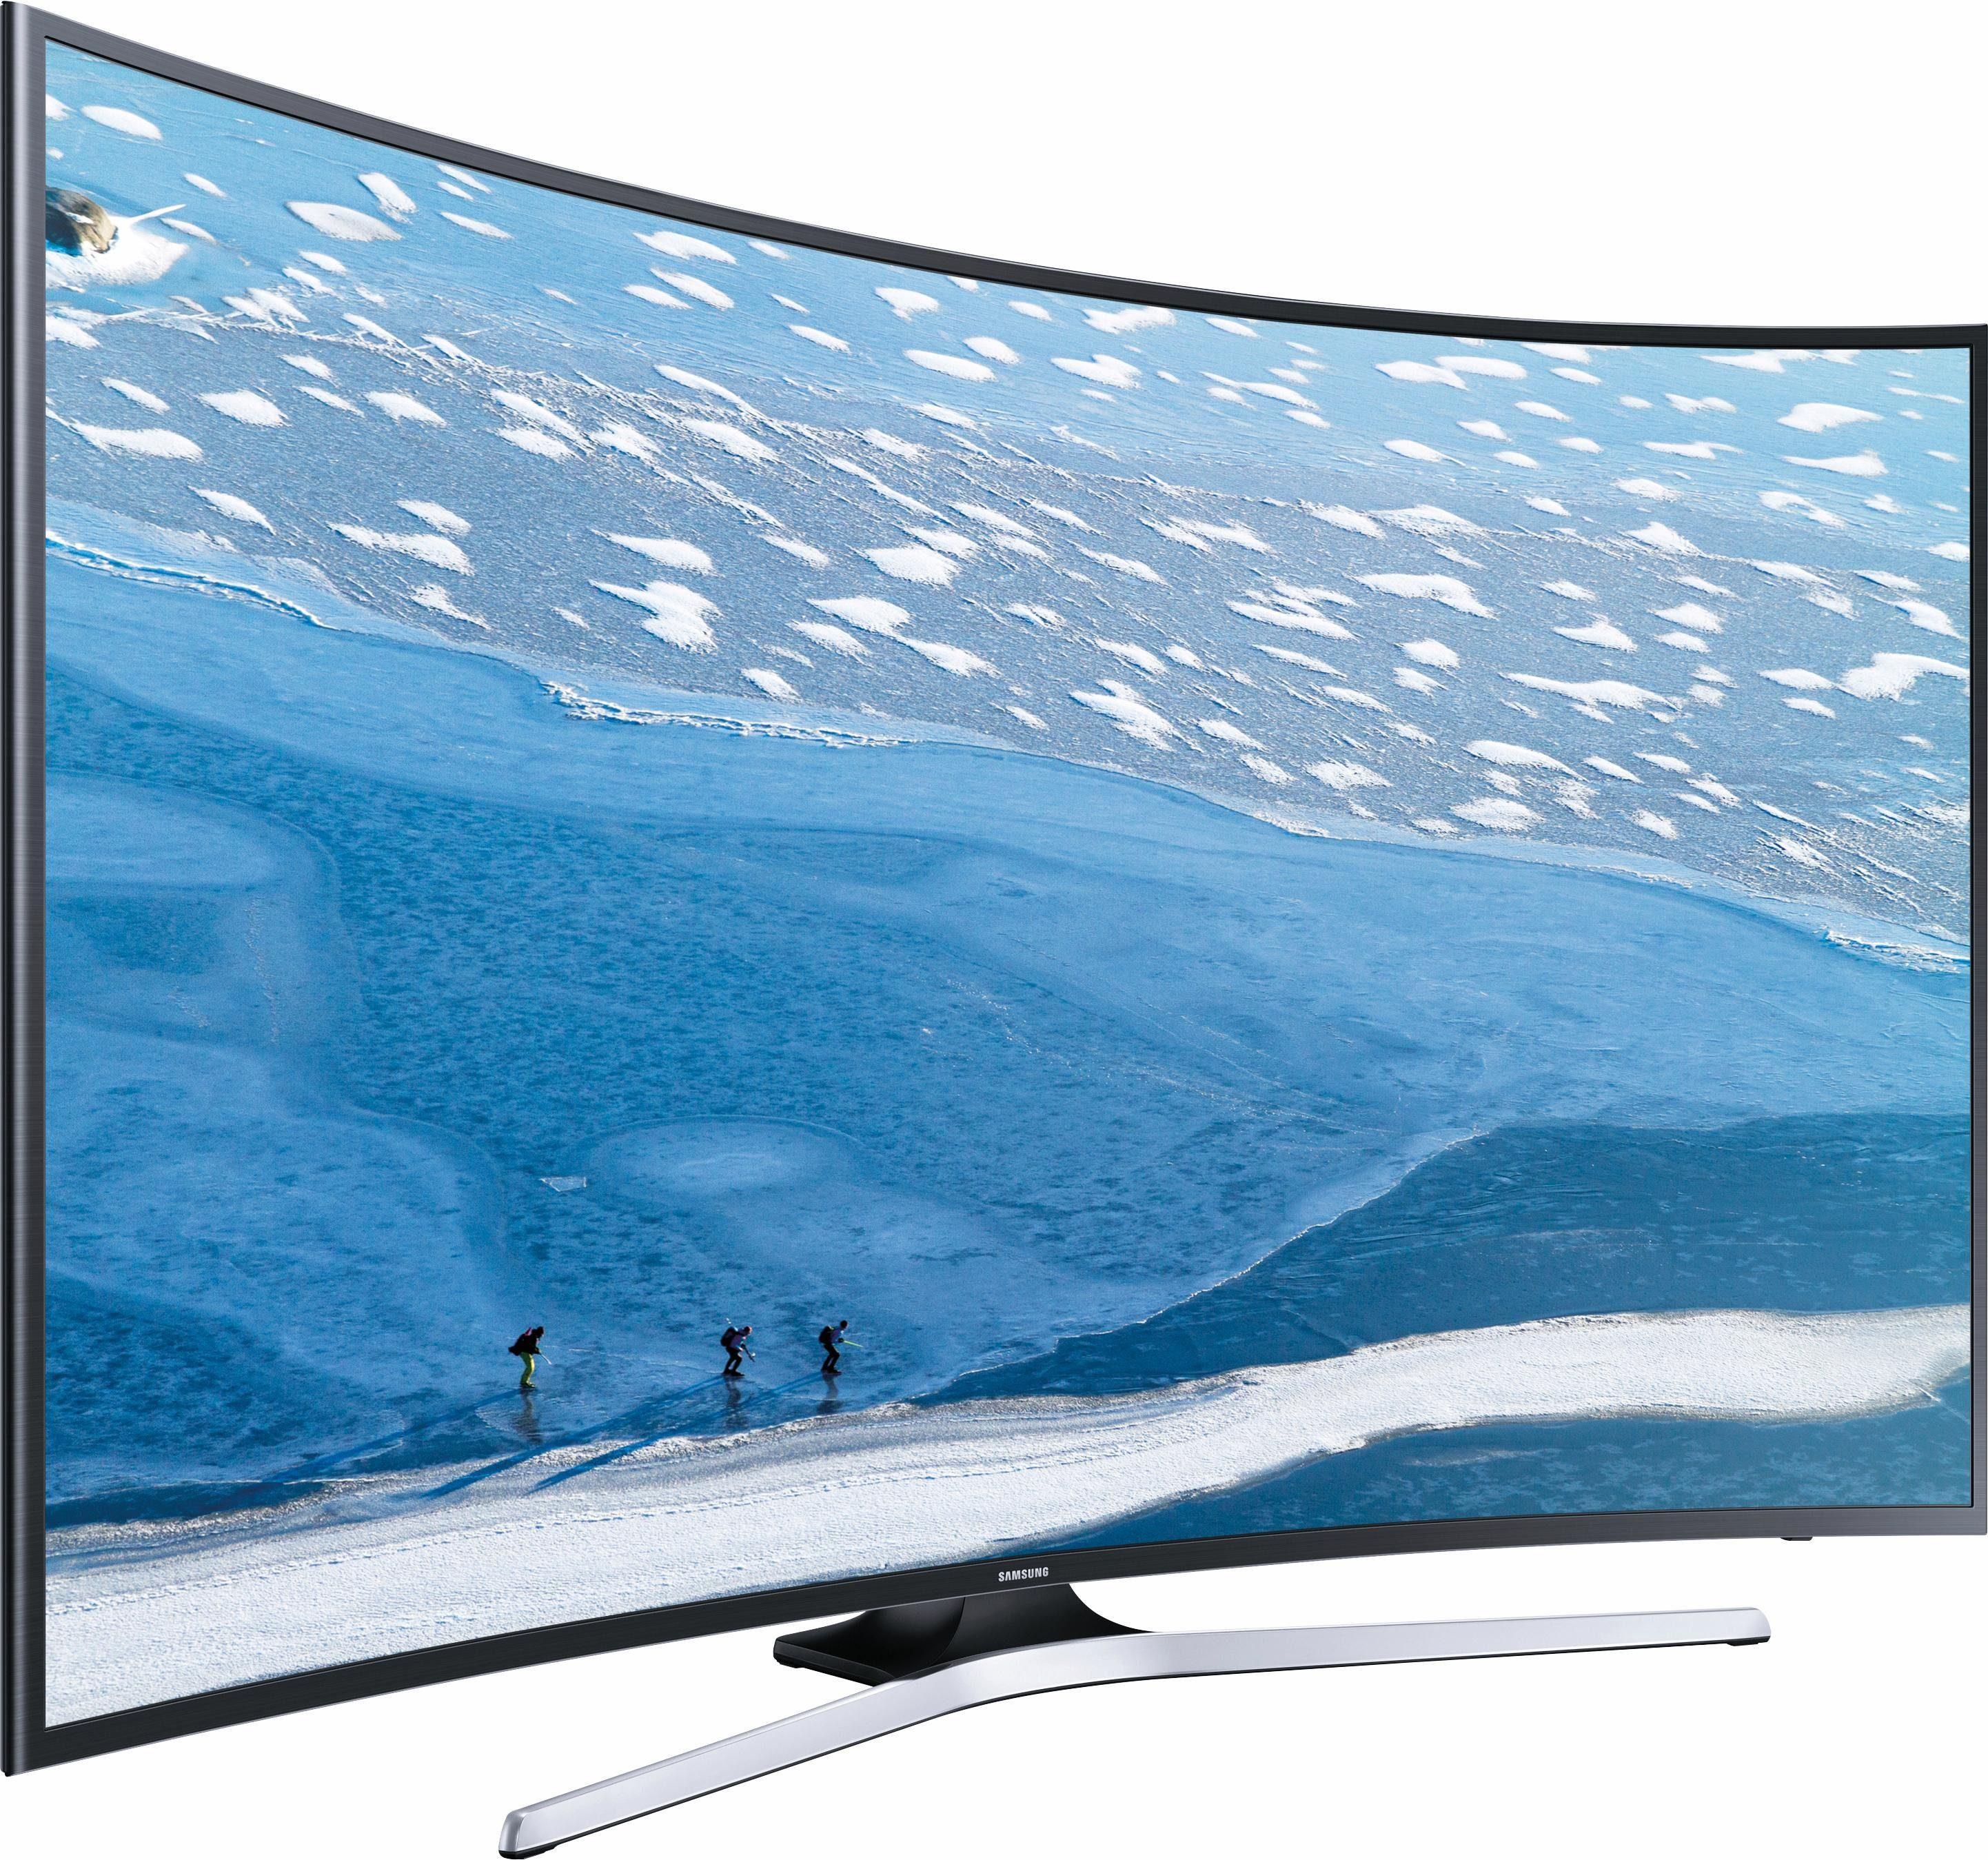 Samsung UE40KU6179UXZG, Curved-LED-Fernseher, 101 cm (40 Zoll), 2160p (4K Ultra HD), Smart-TV